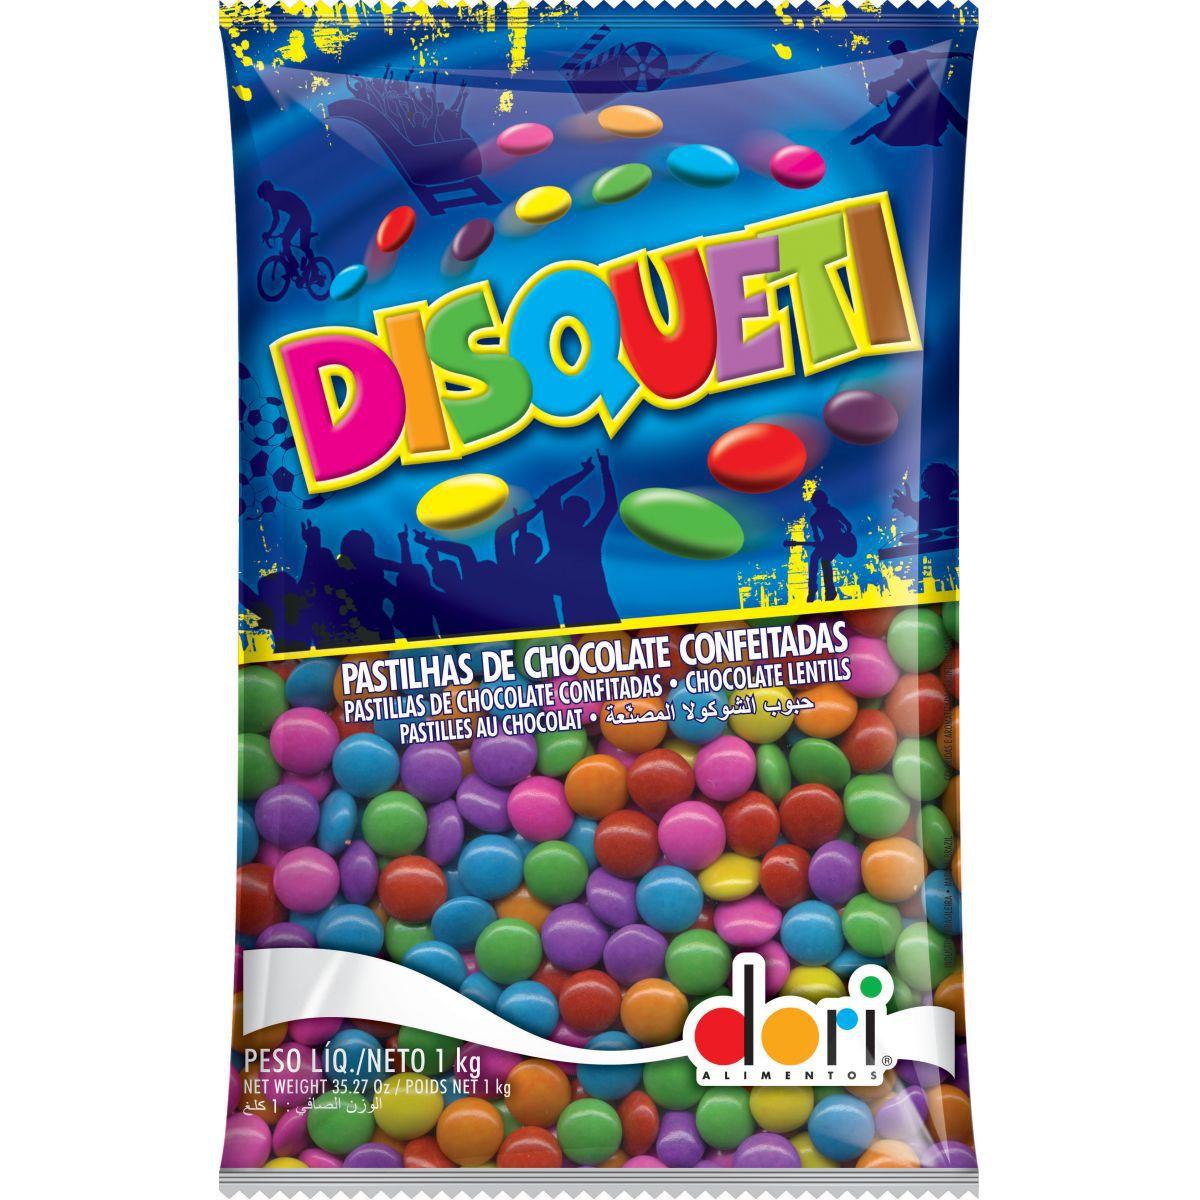 Confete Disqueti 1kg